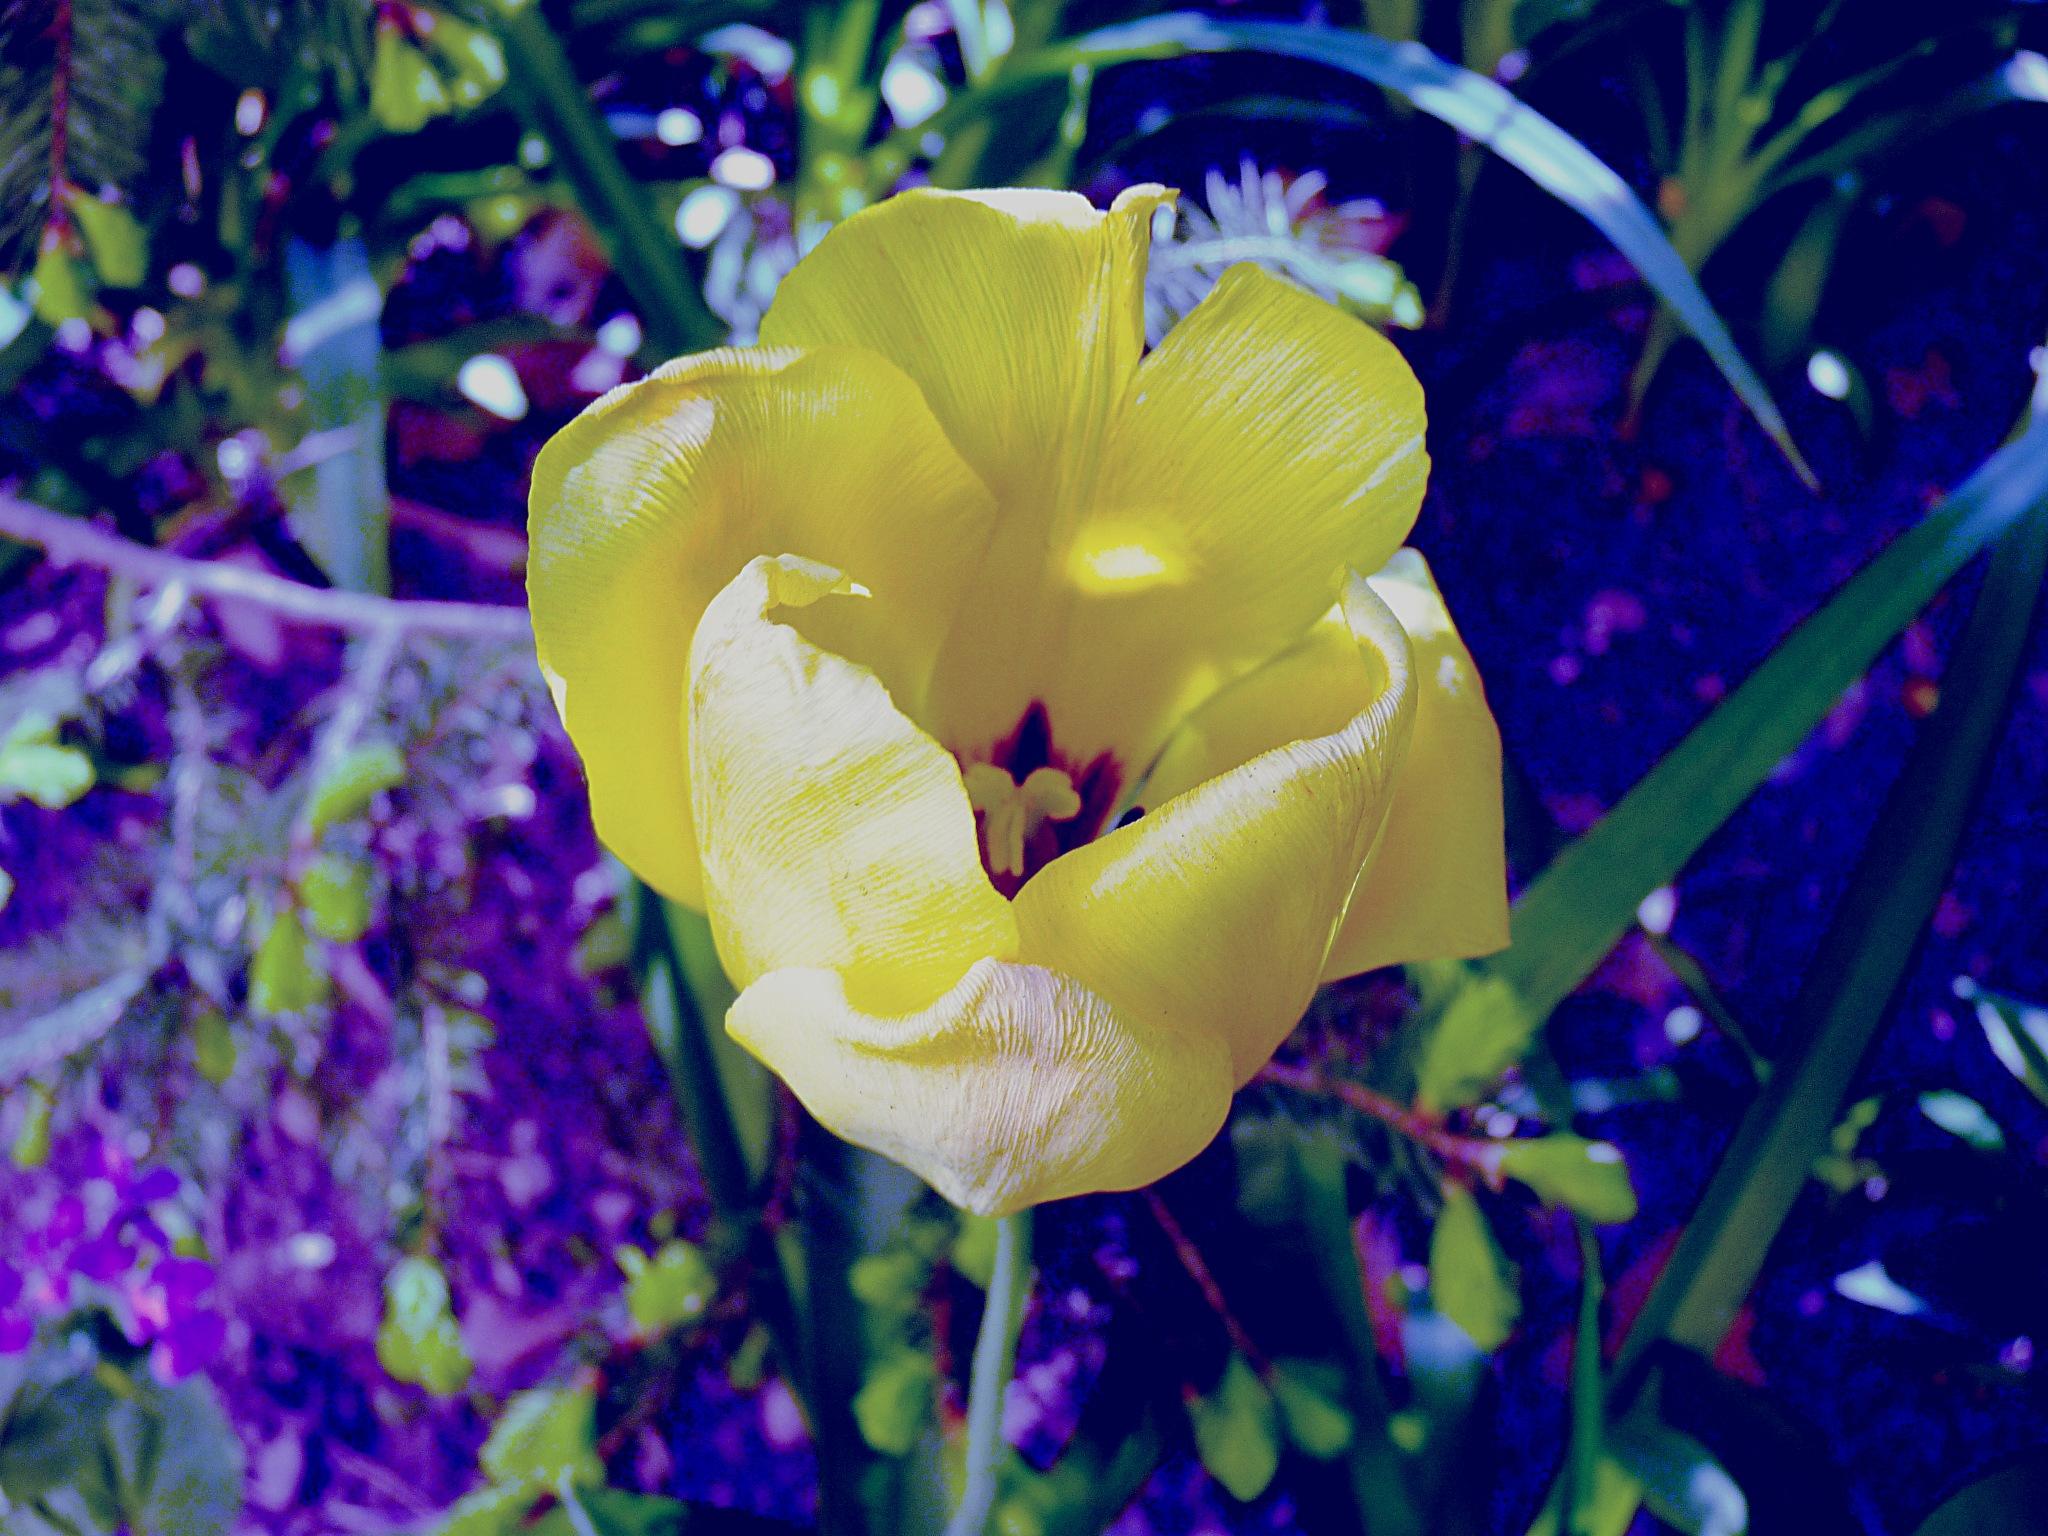 Tulipan II by zvnktomasevic